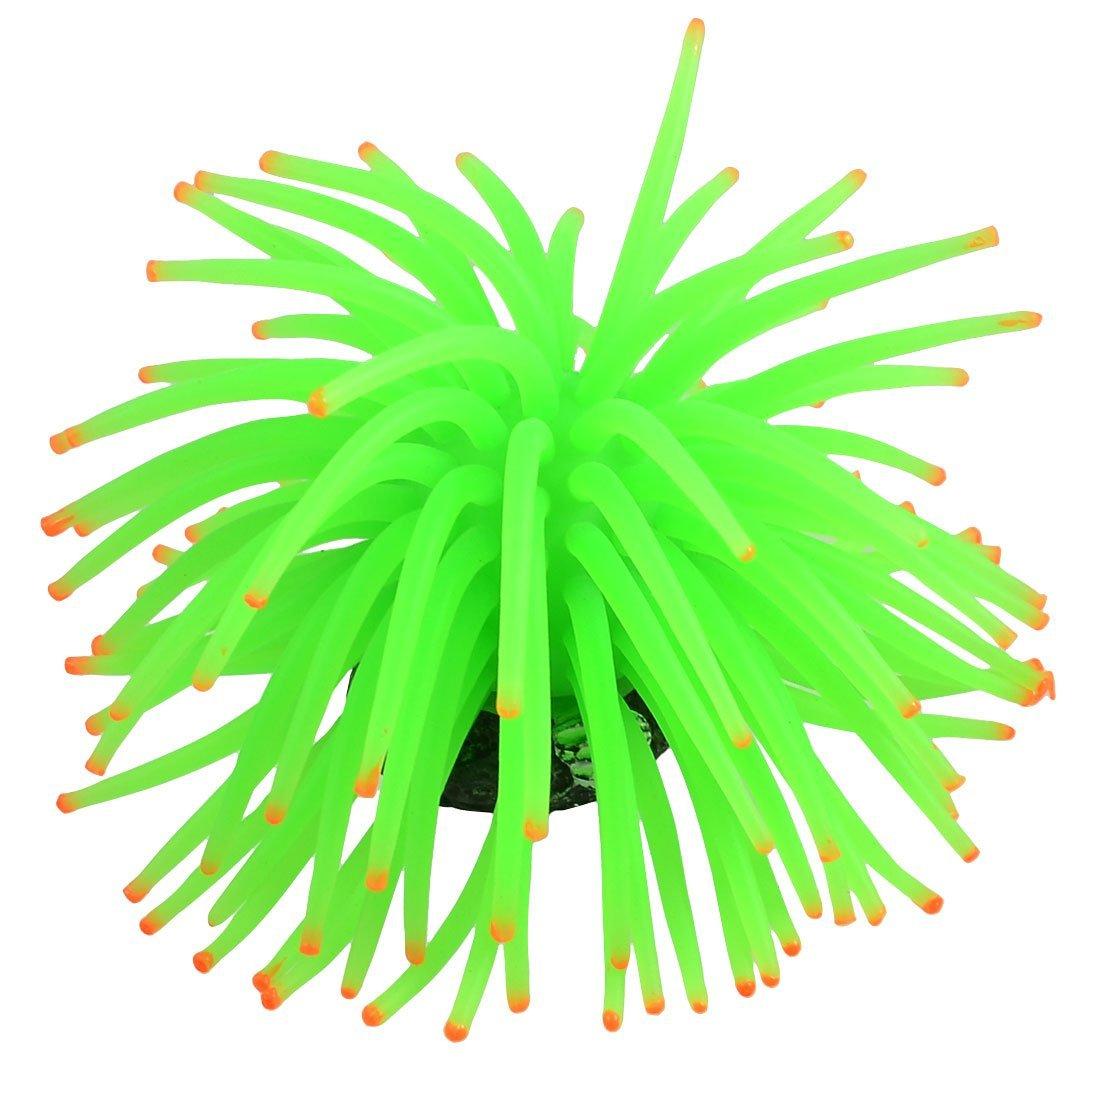 Uxcell a12080700ux0014 Green Tentacle orange Tip Aquarium Simulation Soft Coral Decor 4.3  Diameter